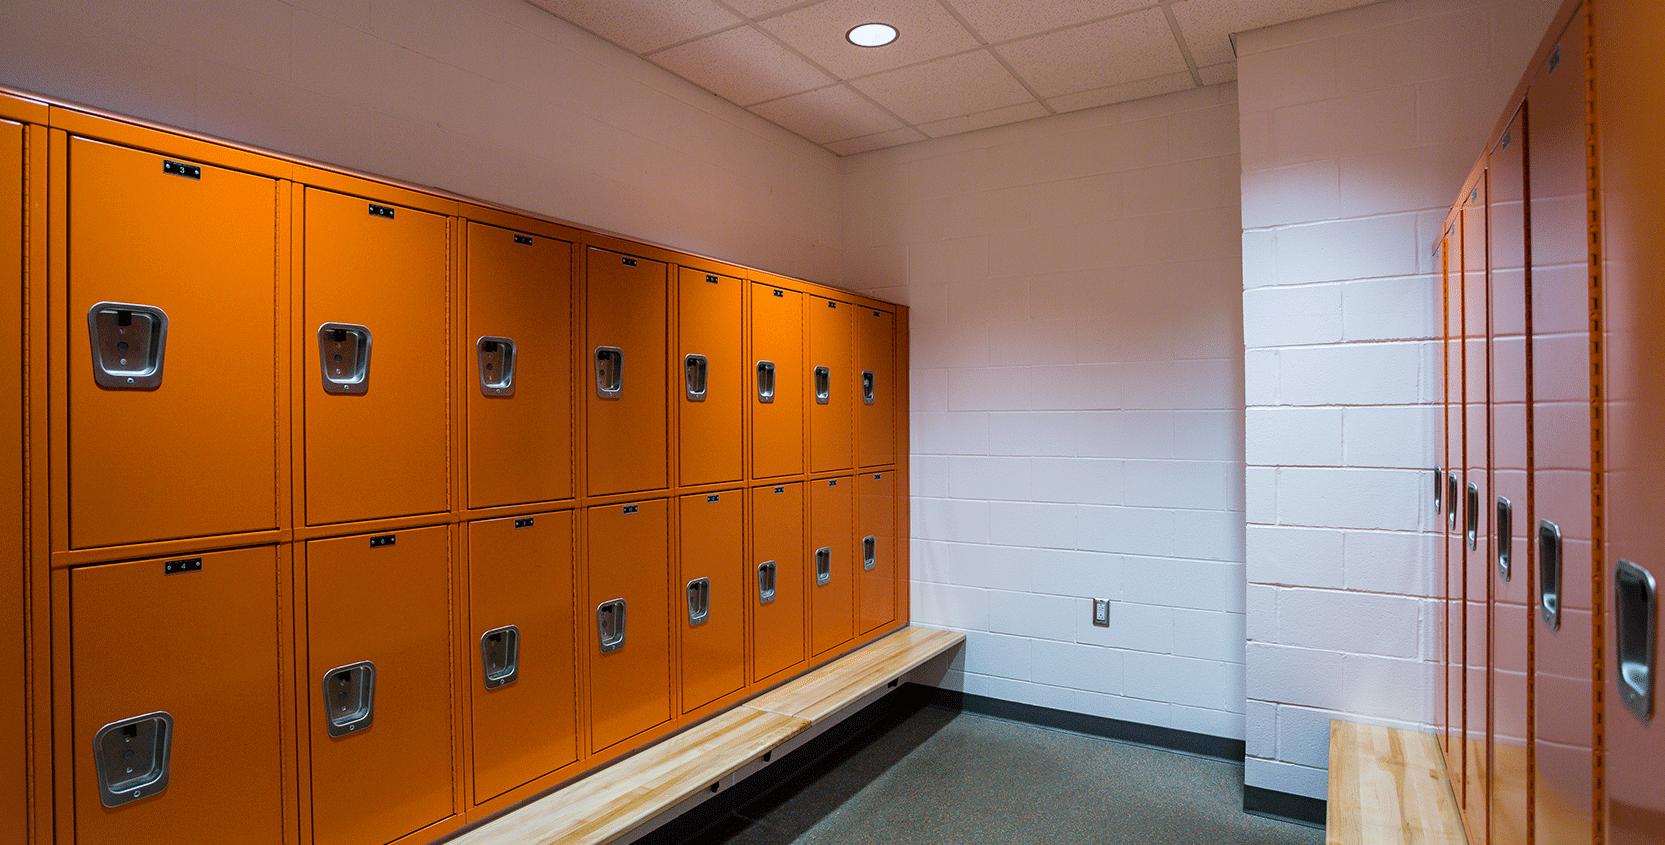 Kalamazoo-College-Fitness-&-Wellness-Ctr-Locker-Room-1665x845